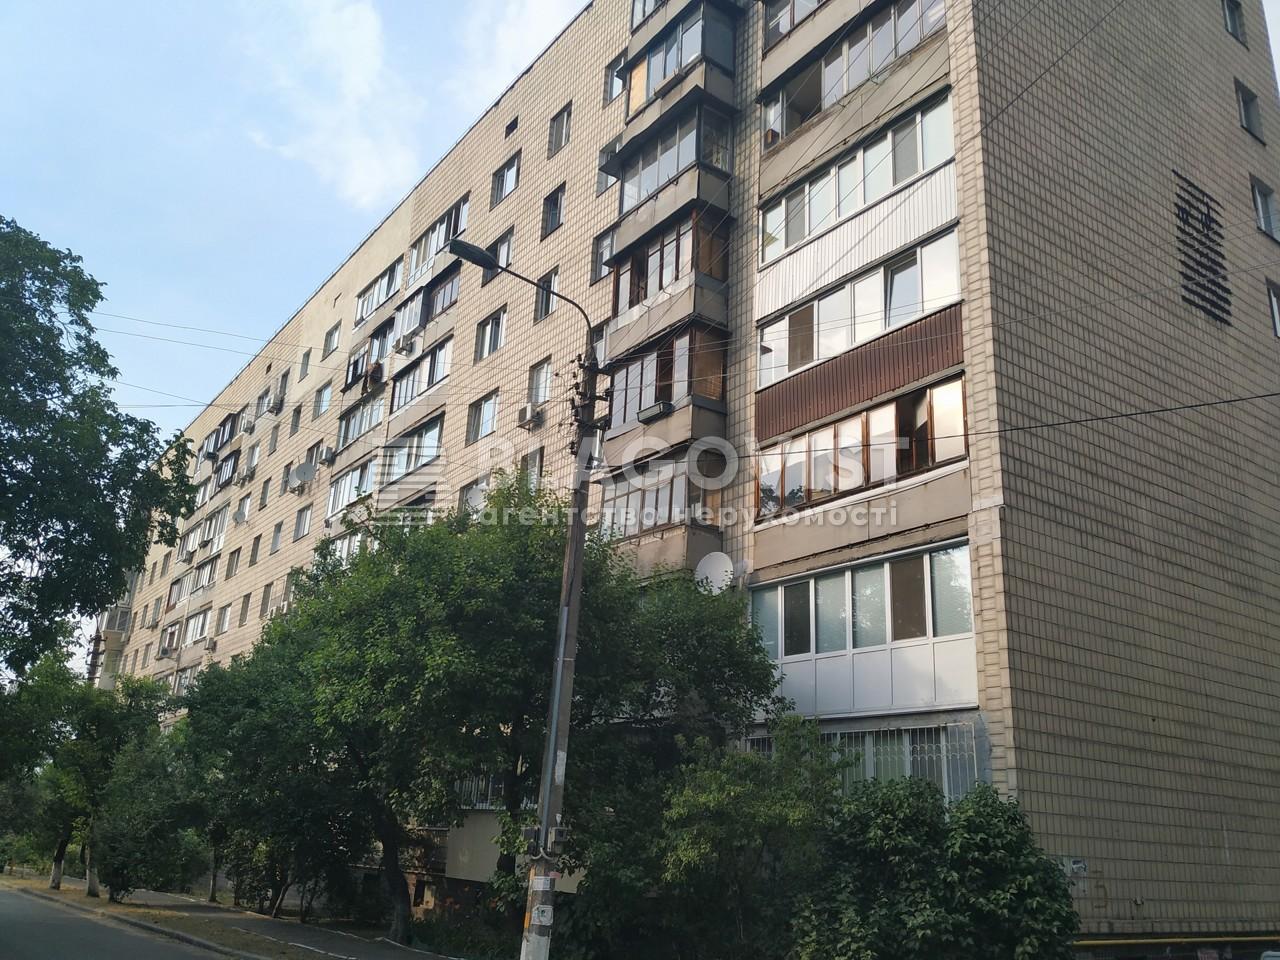 Квартира Z-944125, Малокитаевская, 3, Киев - Фото 3